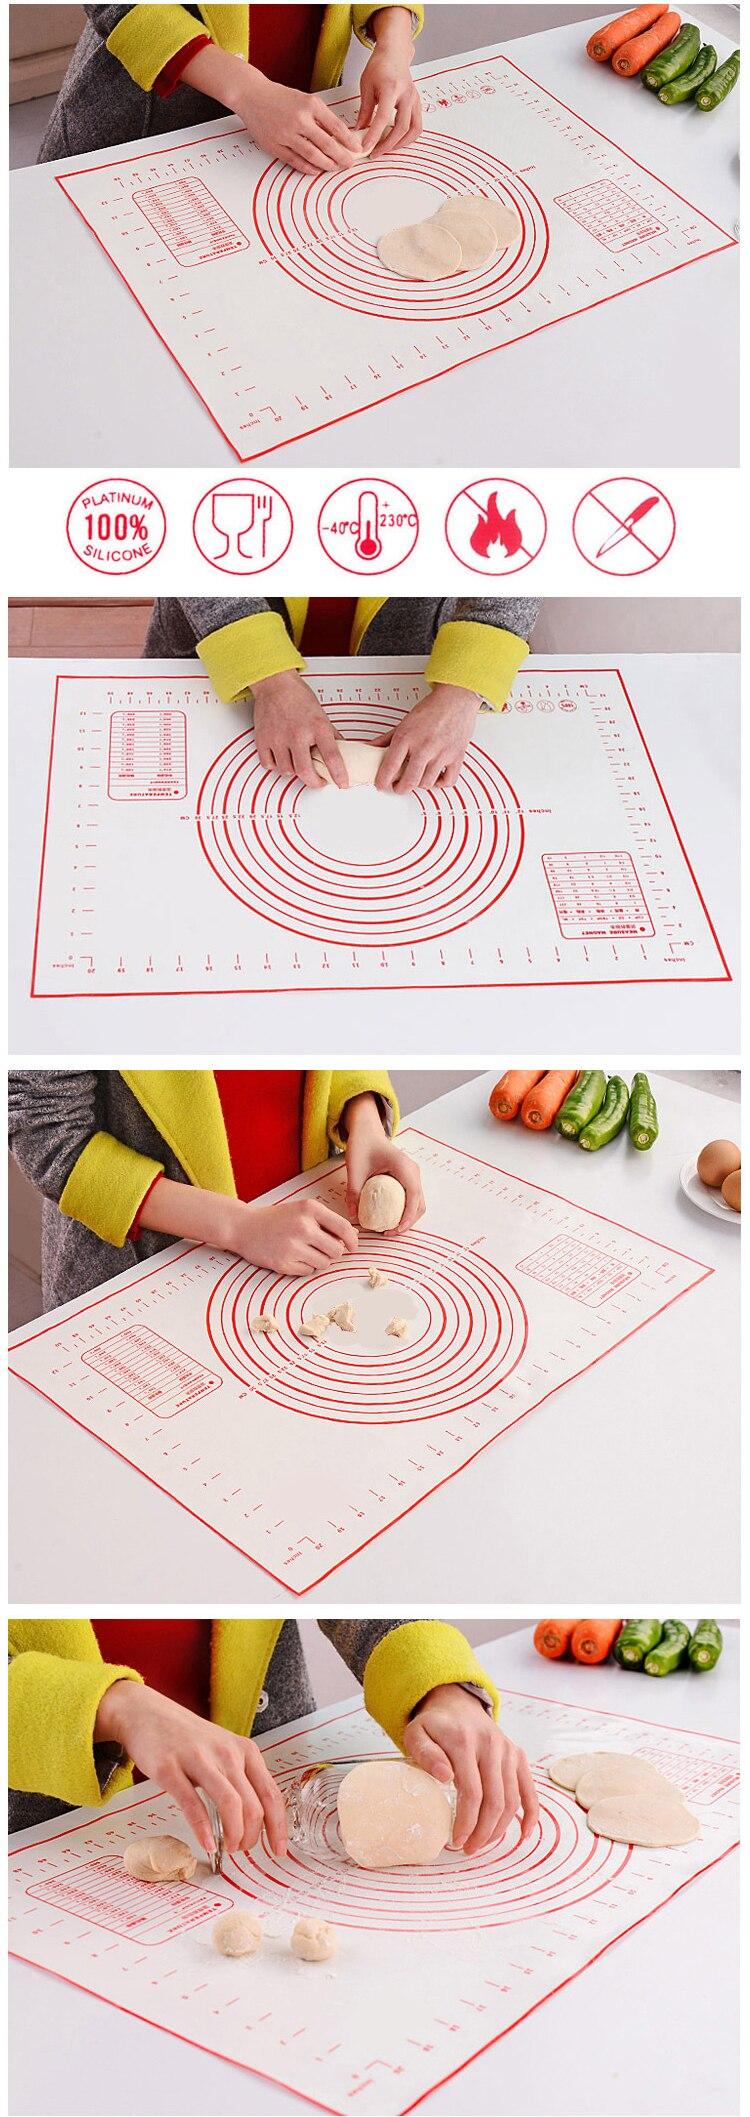 dough making & baking mat